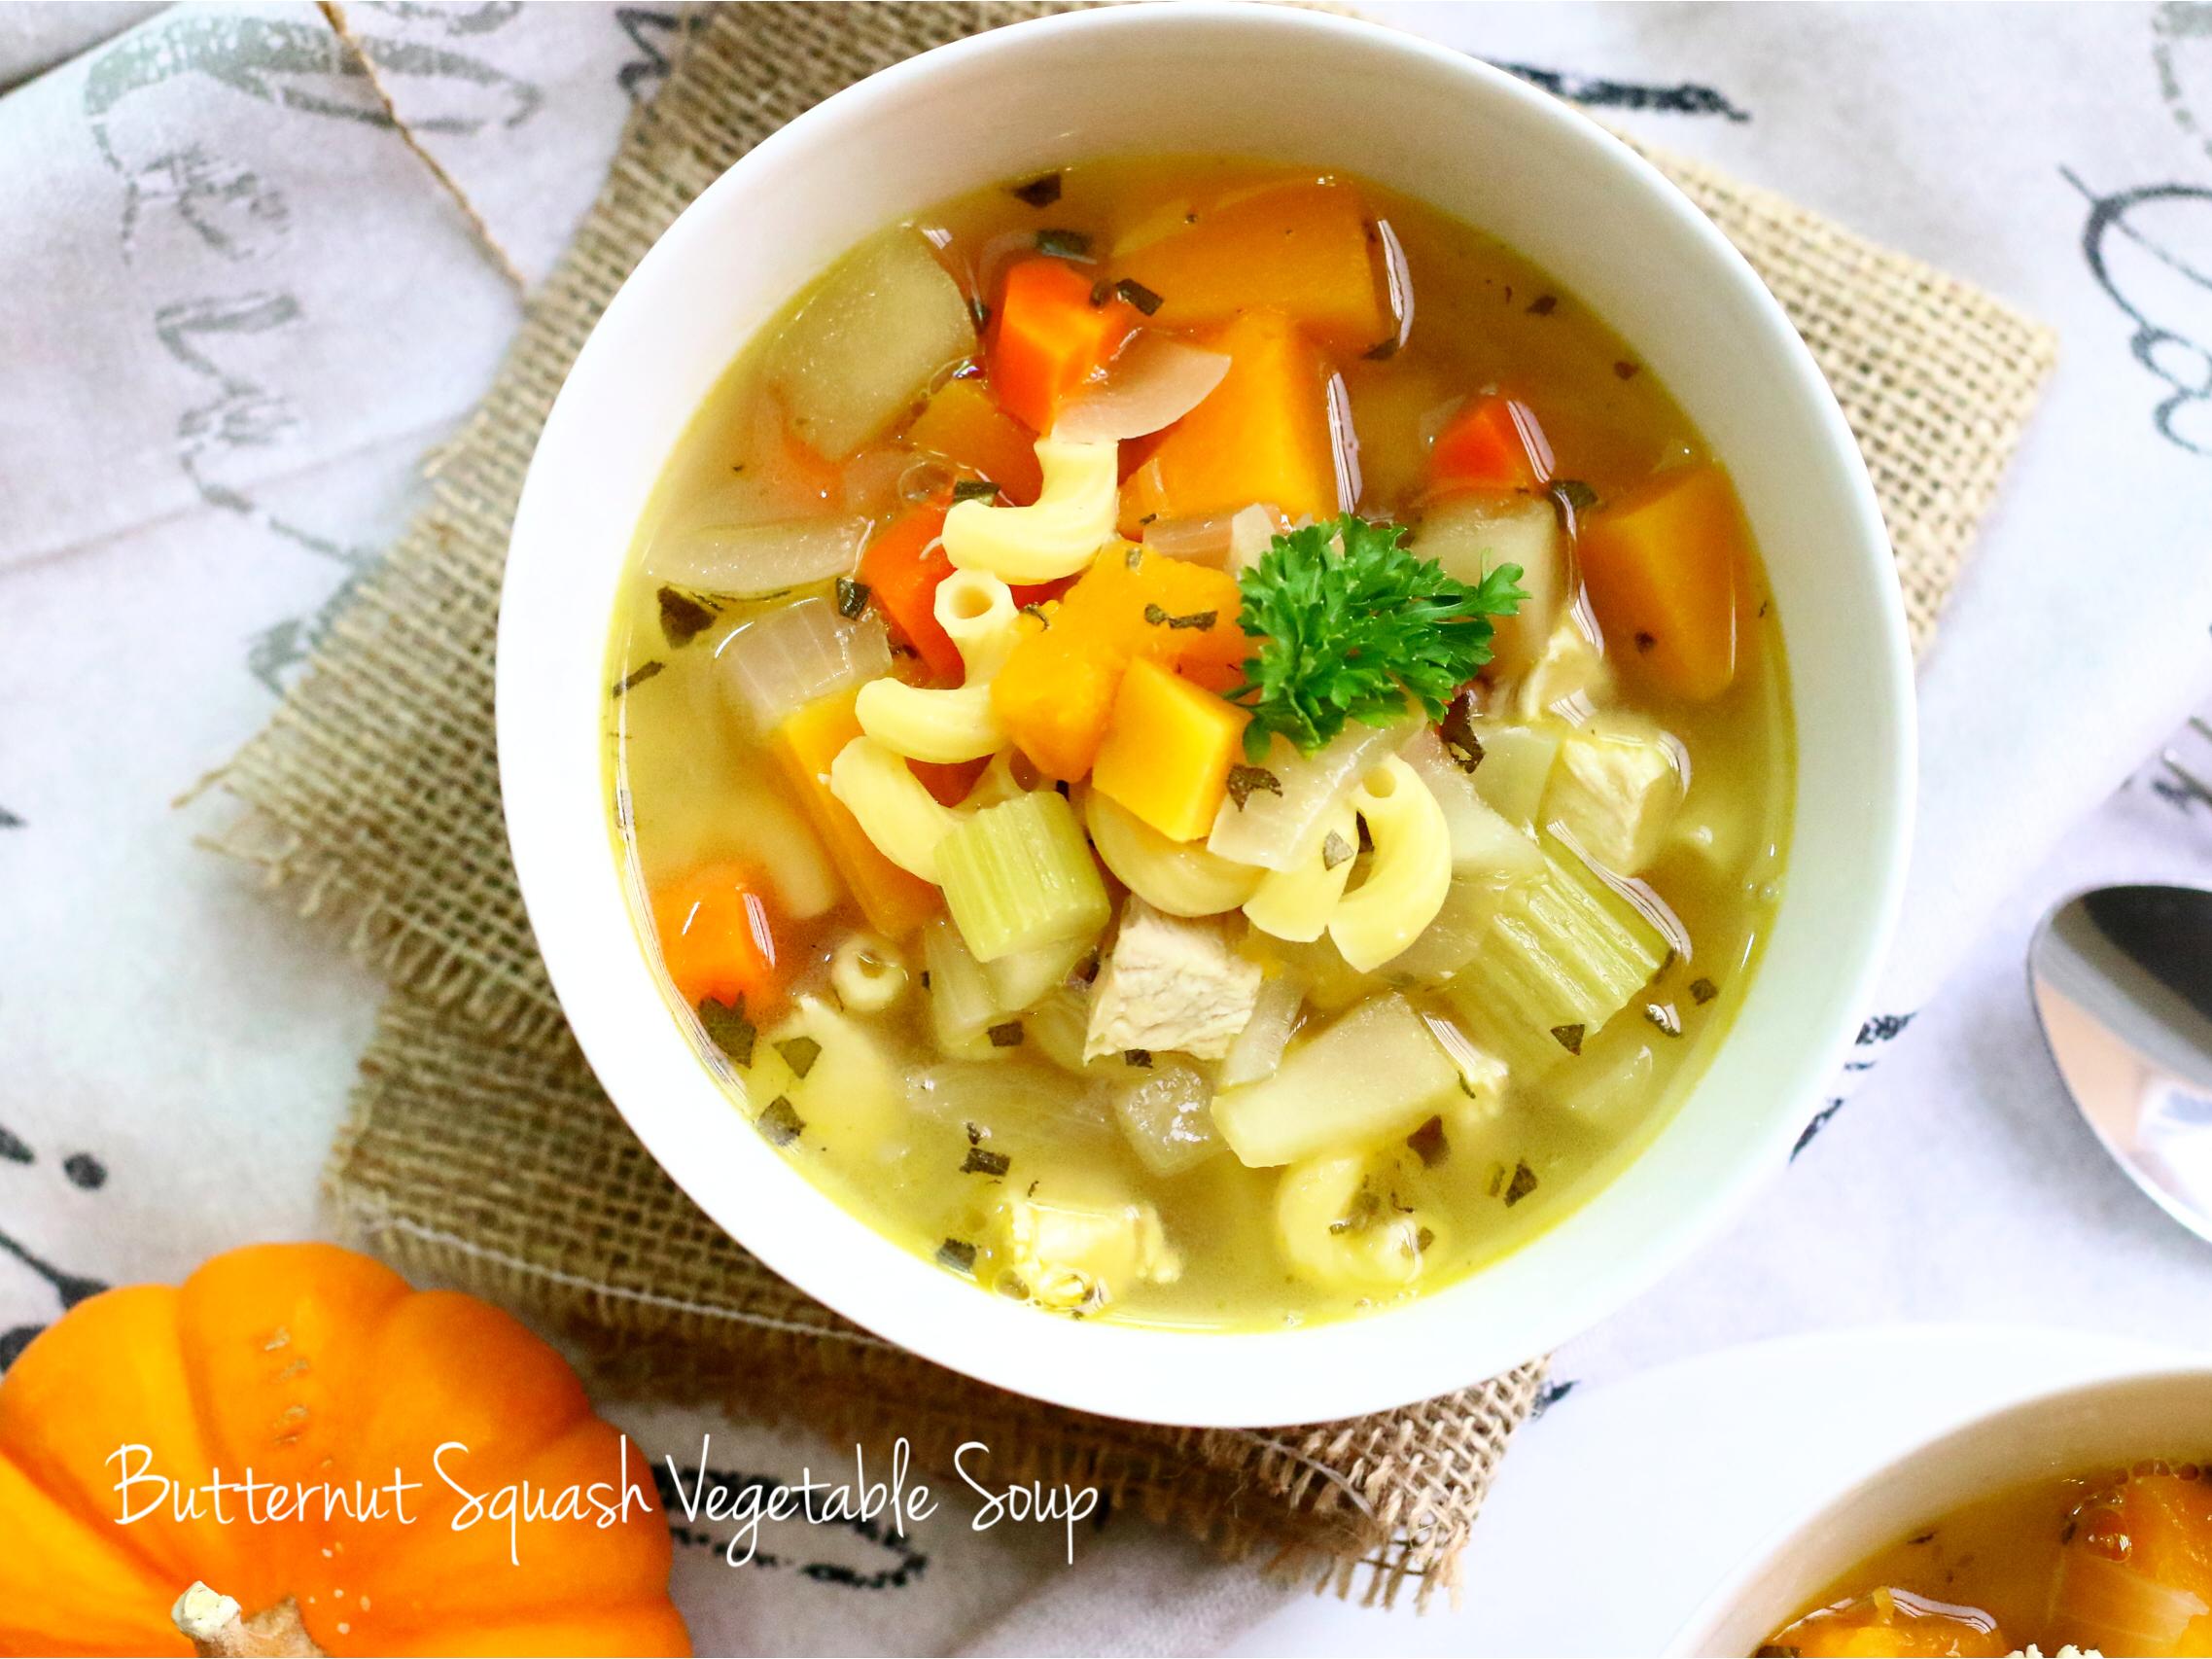 Butternut squash vege soup